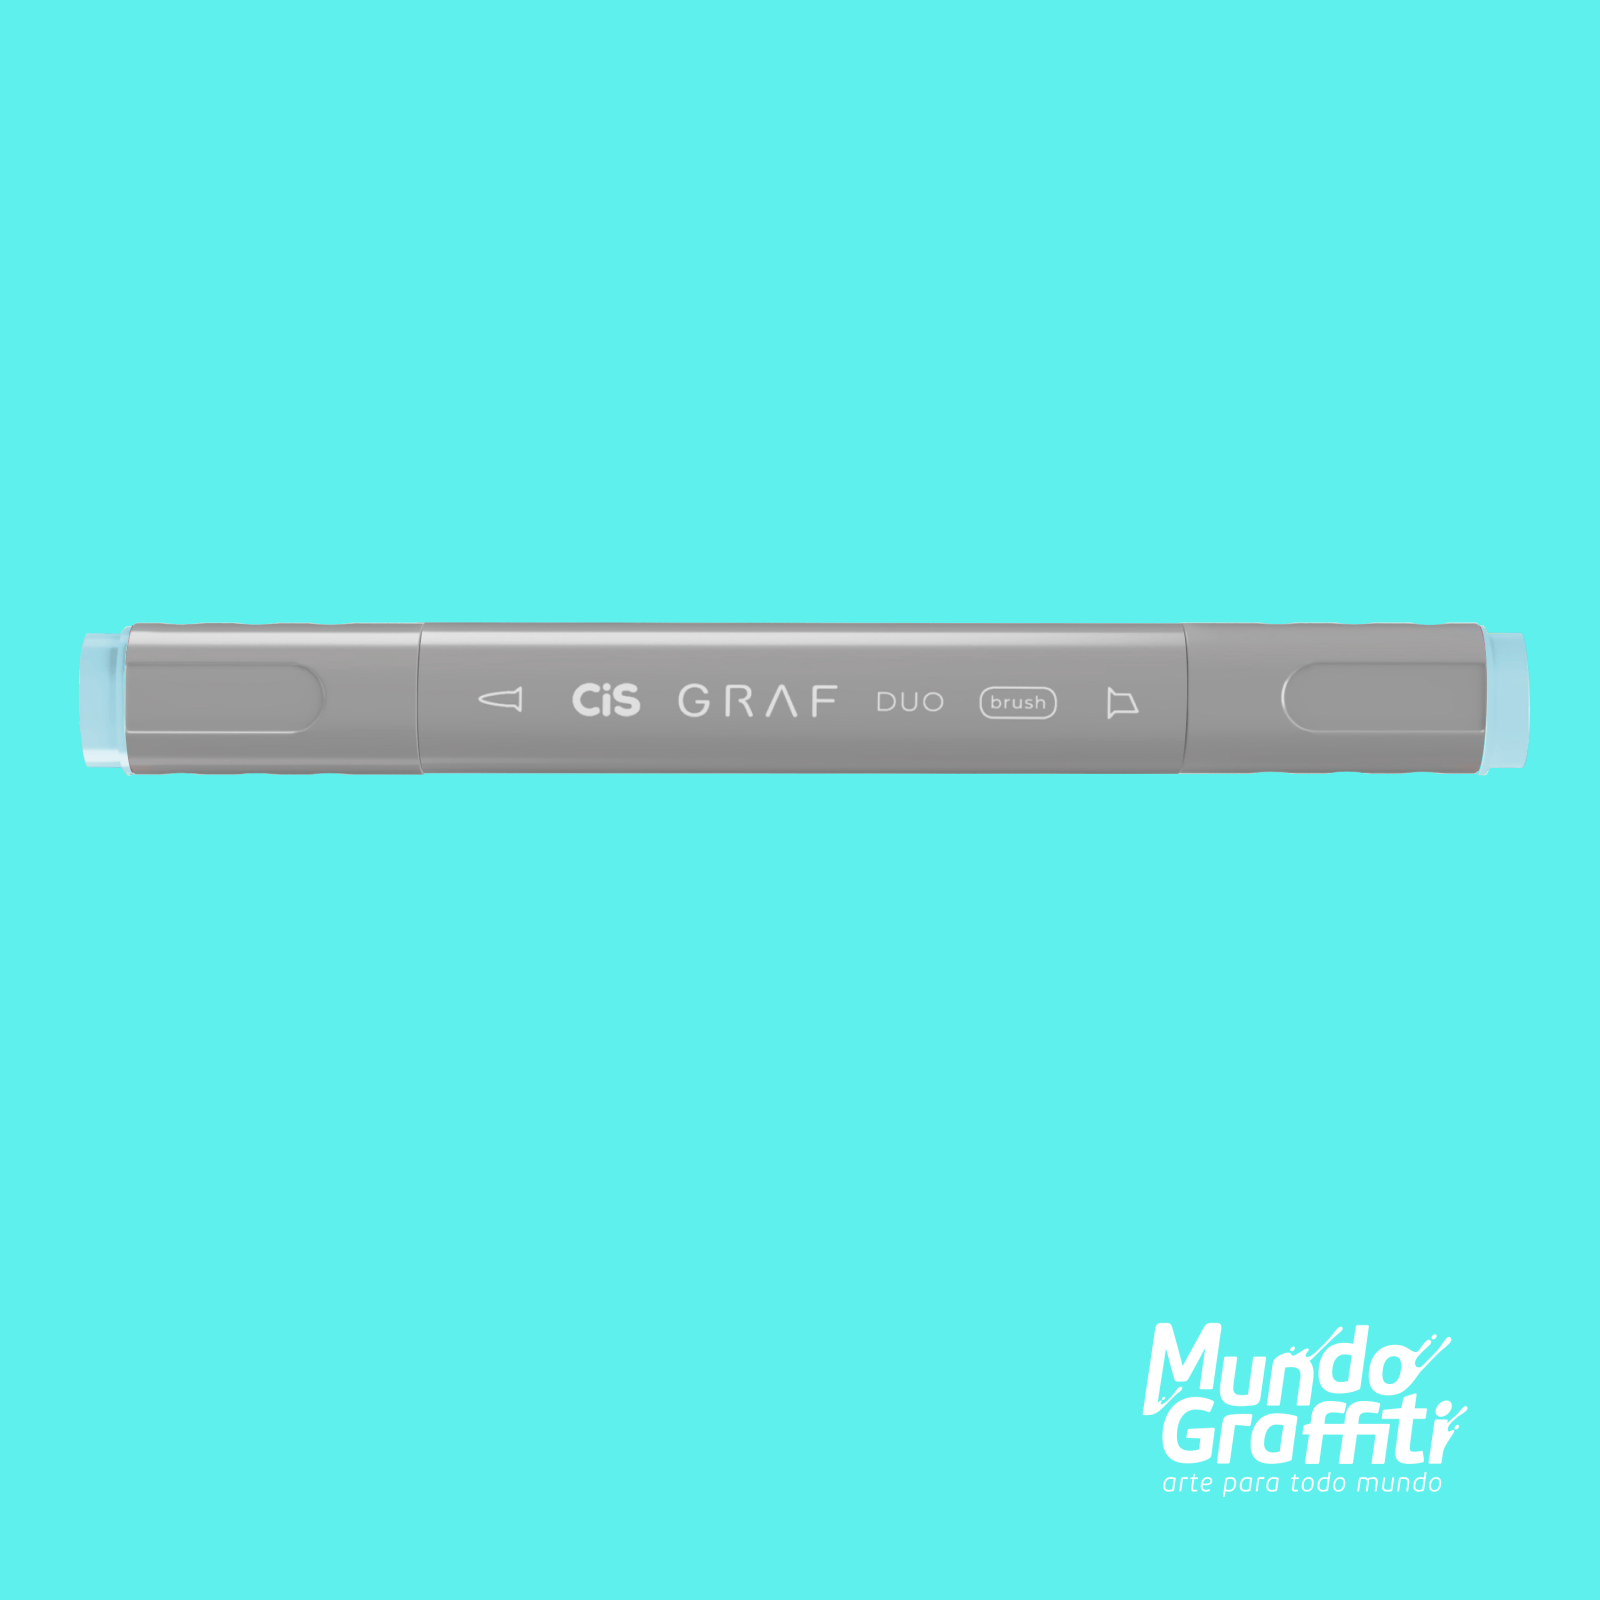 Marcador Cis Graf Duo Brush Pastel Blue 67 - Mundo Graffiti